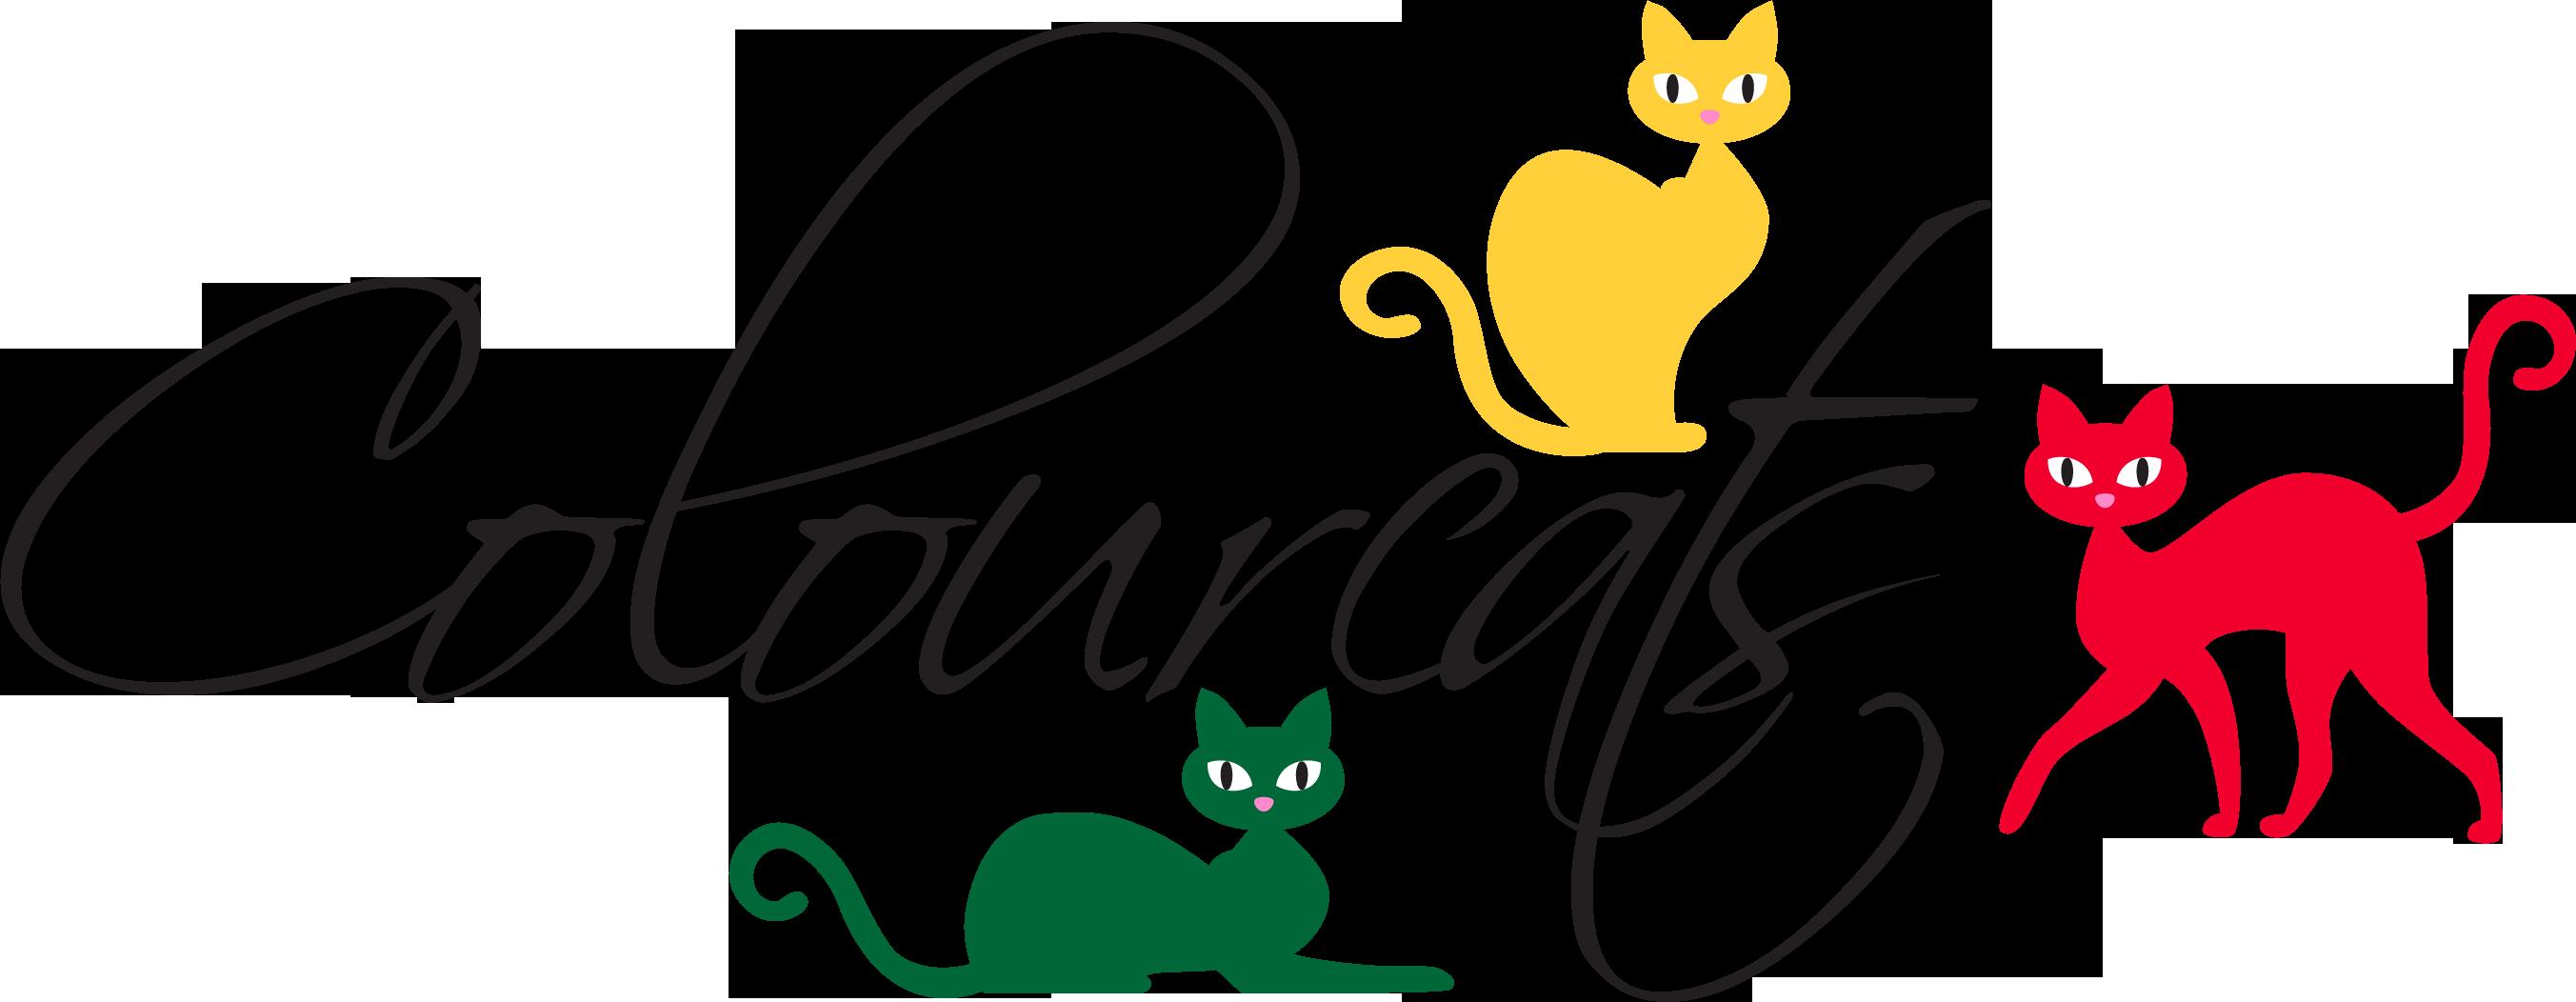 Colourcats - denn Katzen machen das Leben bunter